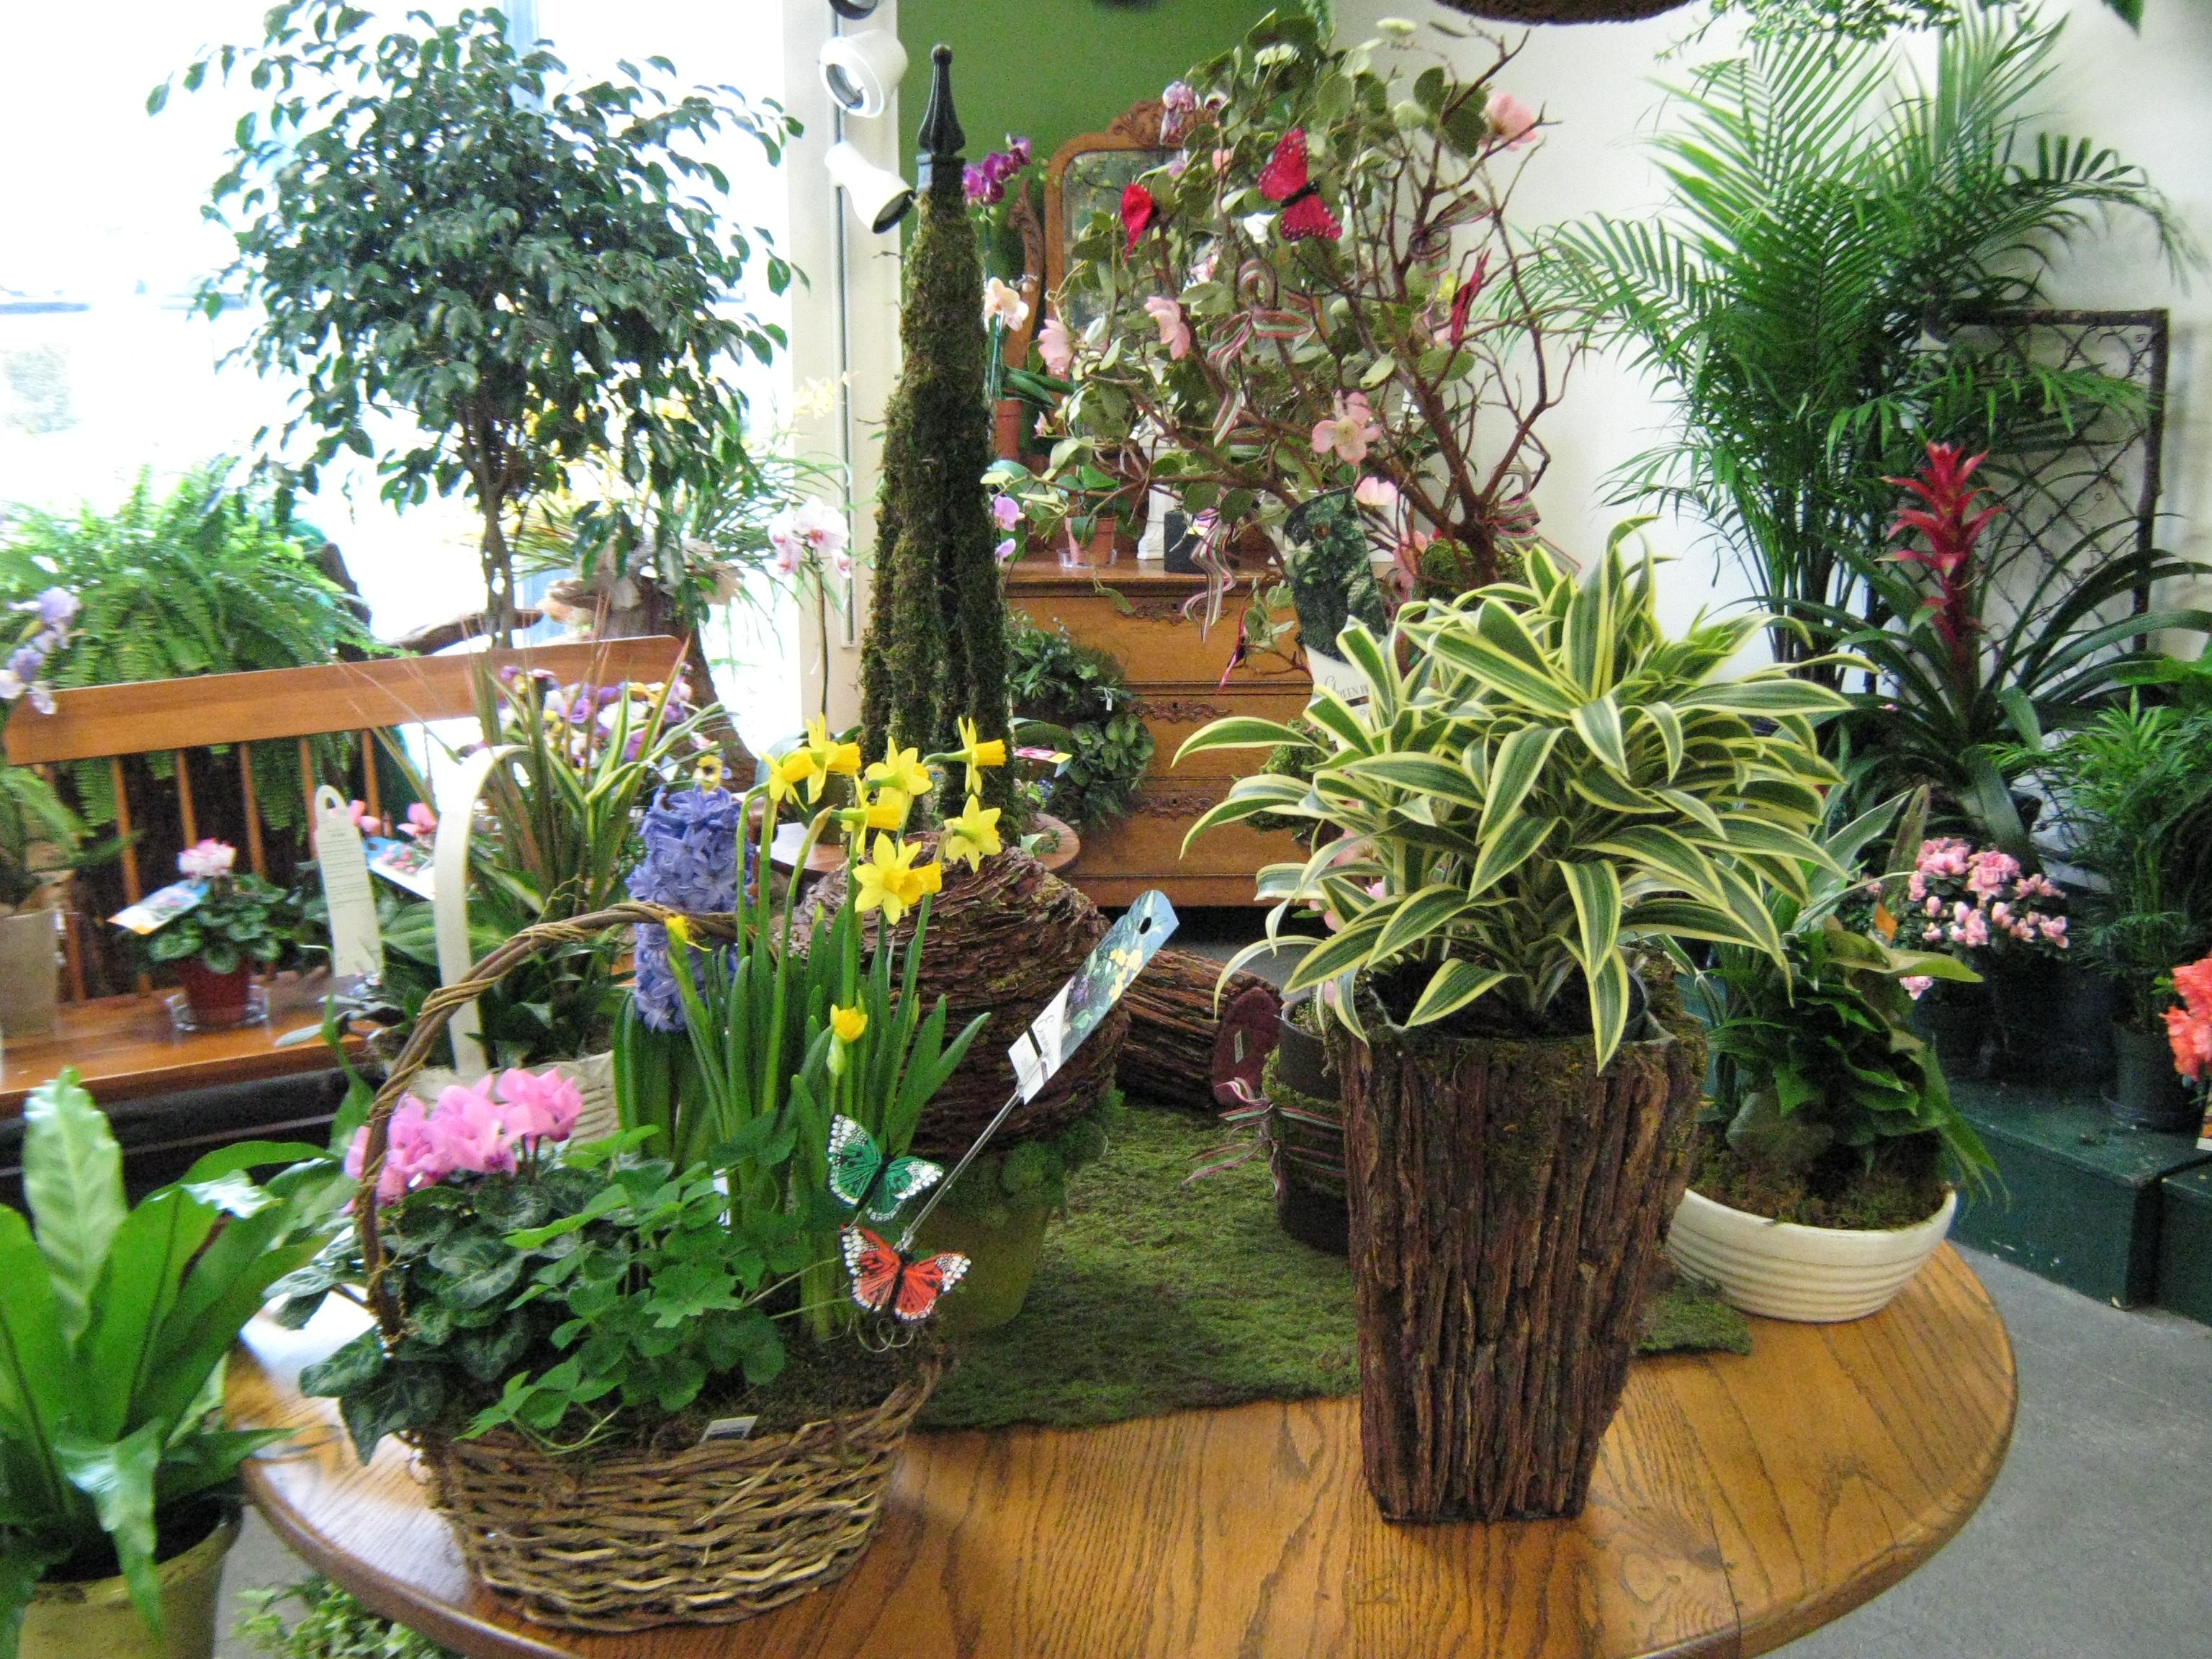 Concord Flower Shop image 6